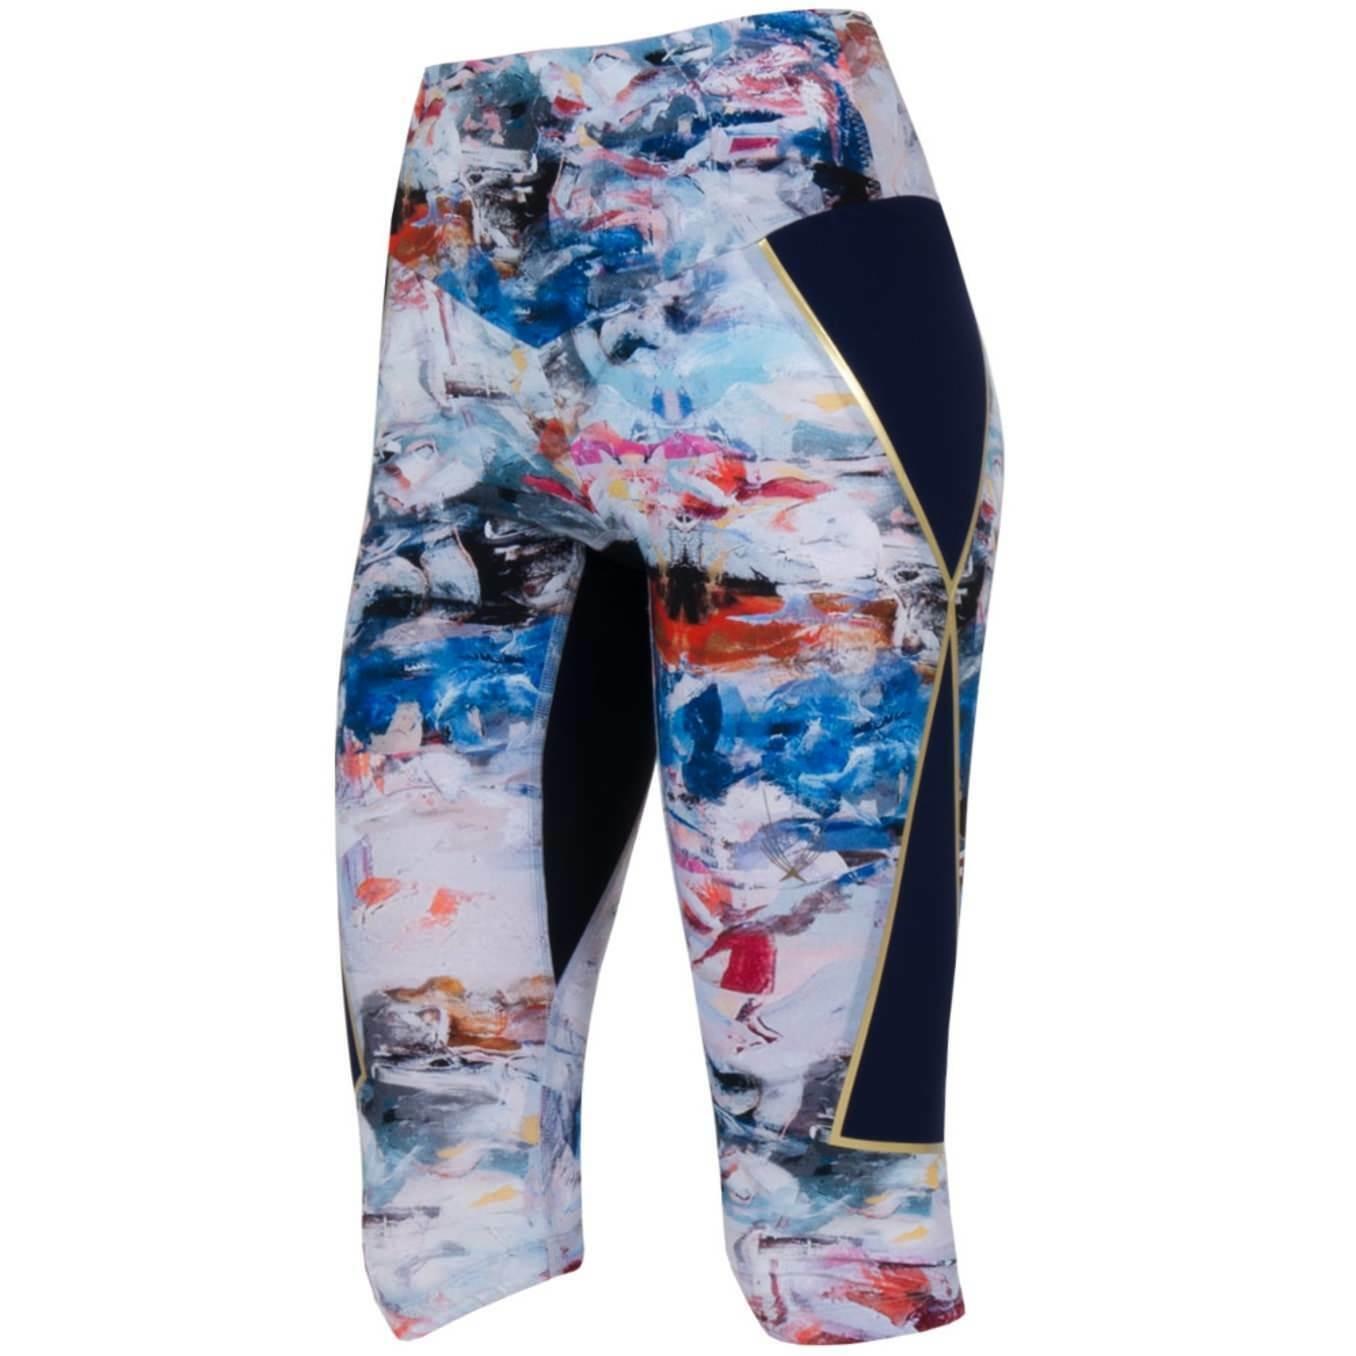 AUTH NWT LUCAS HUGH Nordica Capri Leggings Icebreaker Print  Sz Small